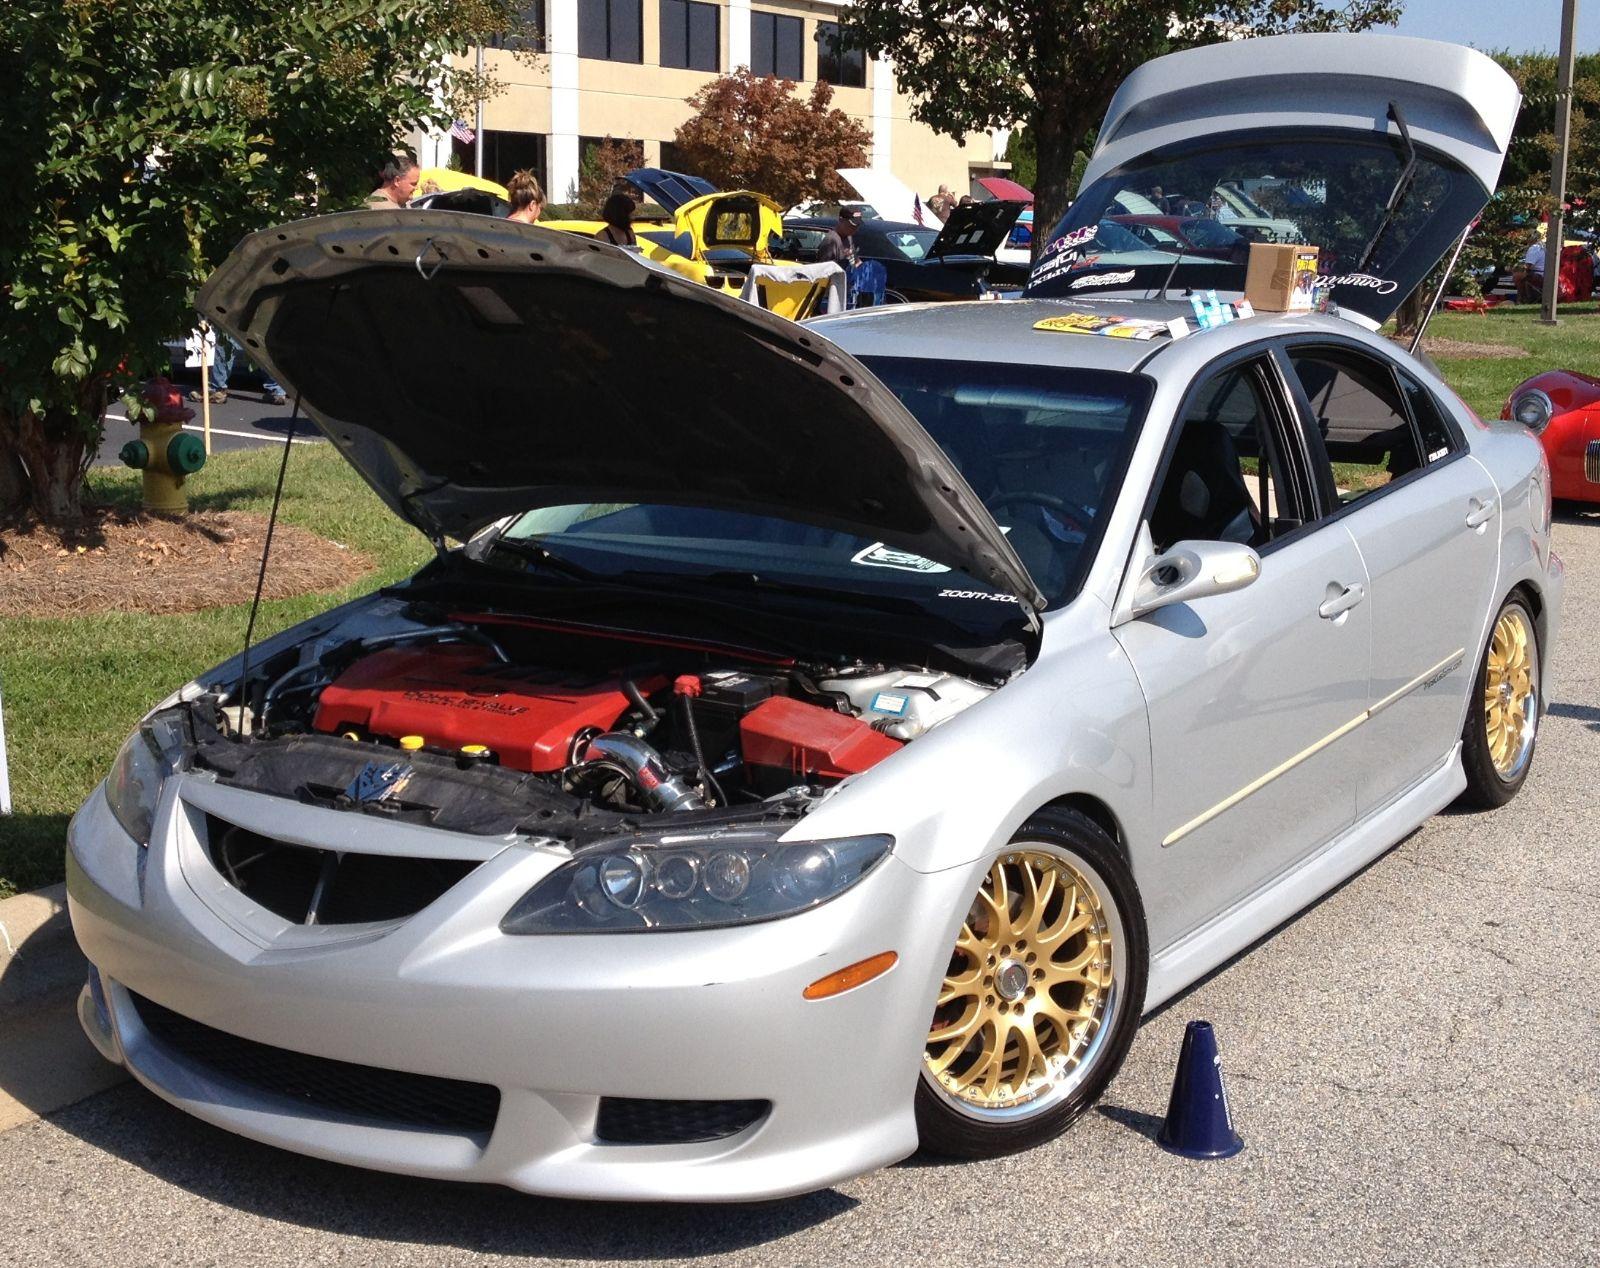 http://img.modifiedcartrader.com/uploaded/XL/2012/12/Mazda-Atenza-6-i-4Dr-Sport-for-sale-custom-32075-305227.jpg